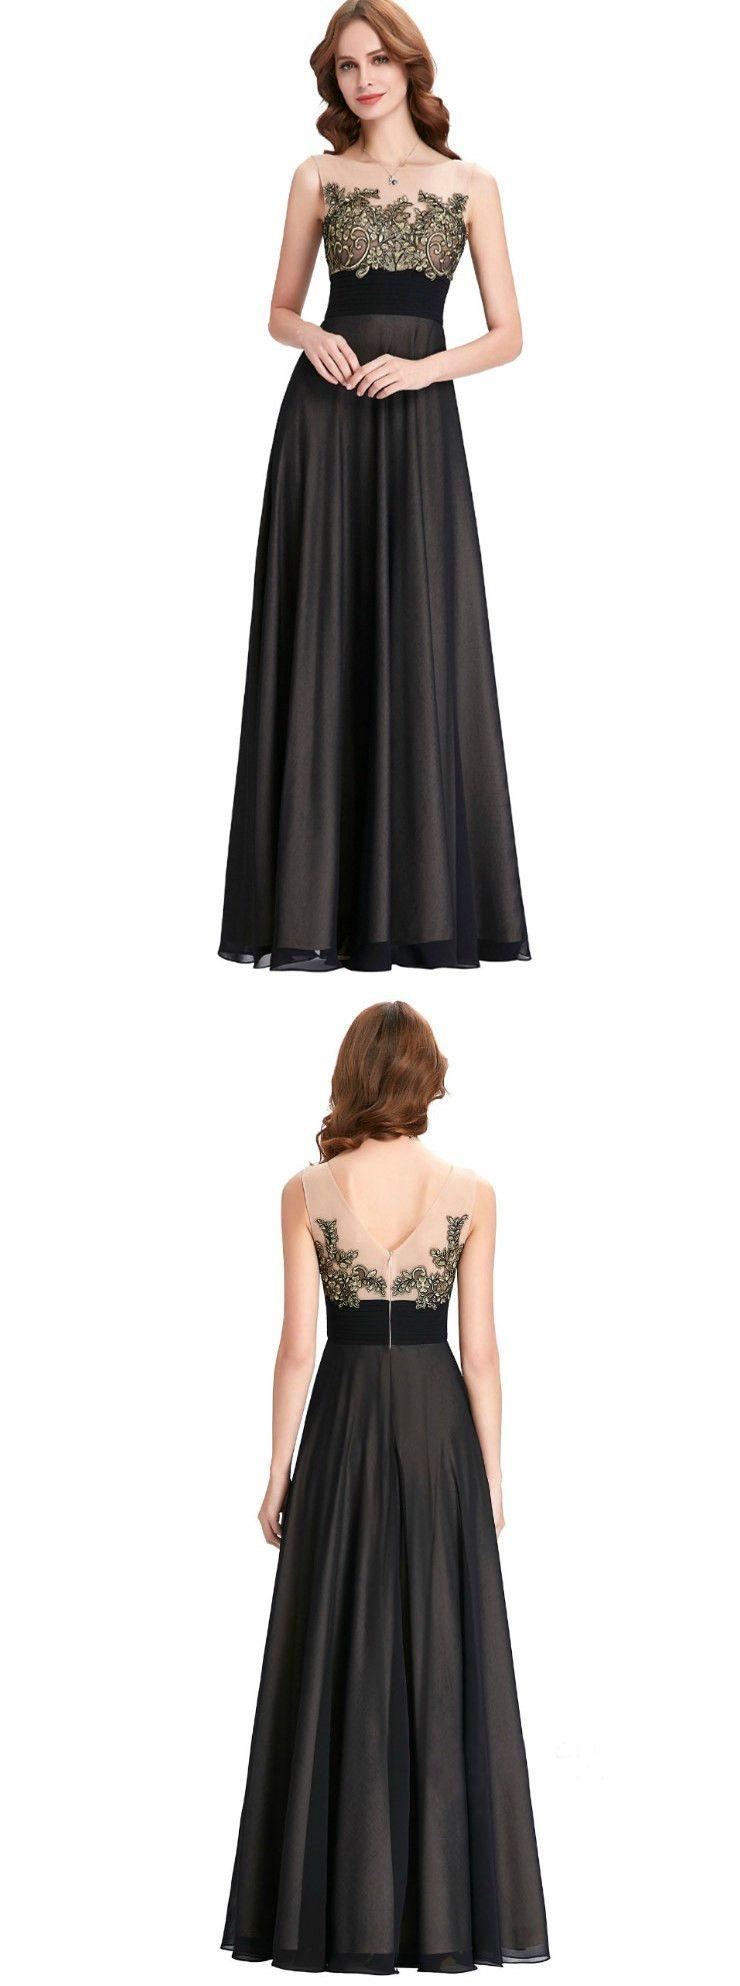 Aline bateau floorlength chiffon vintage prom dresses hx